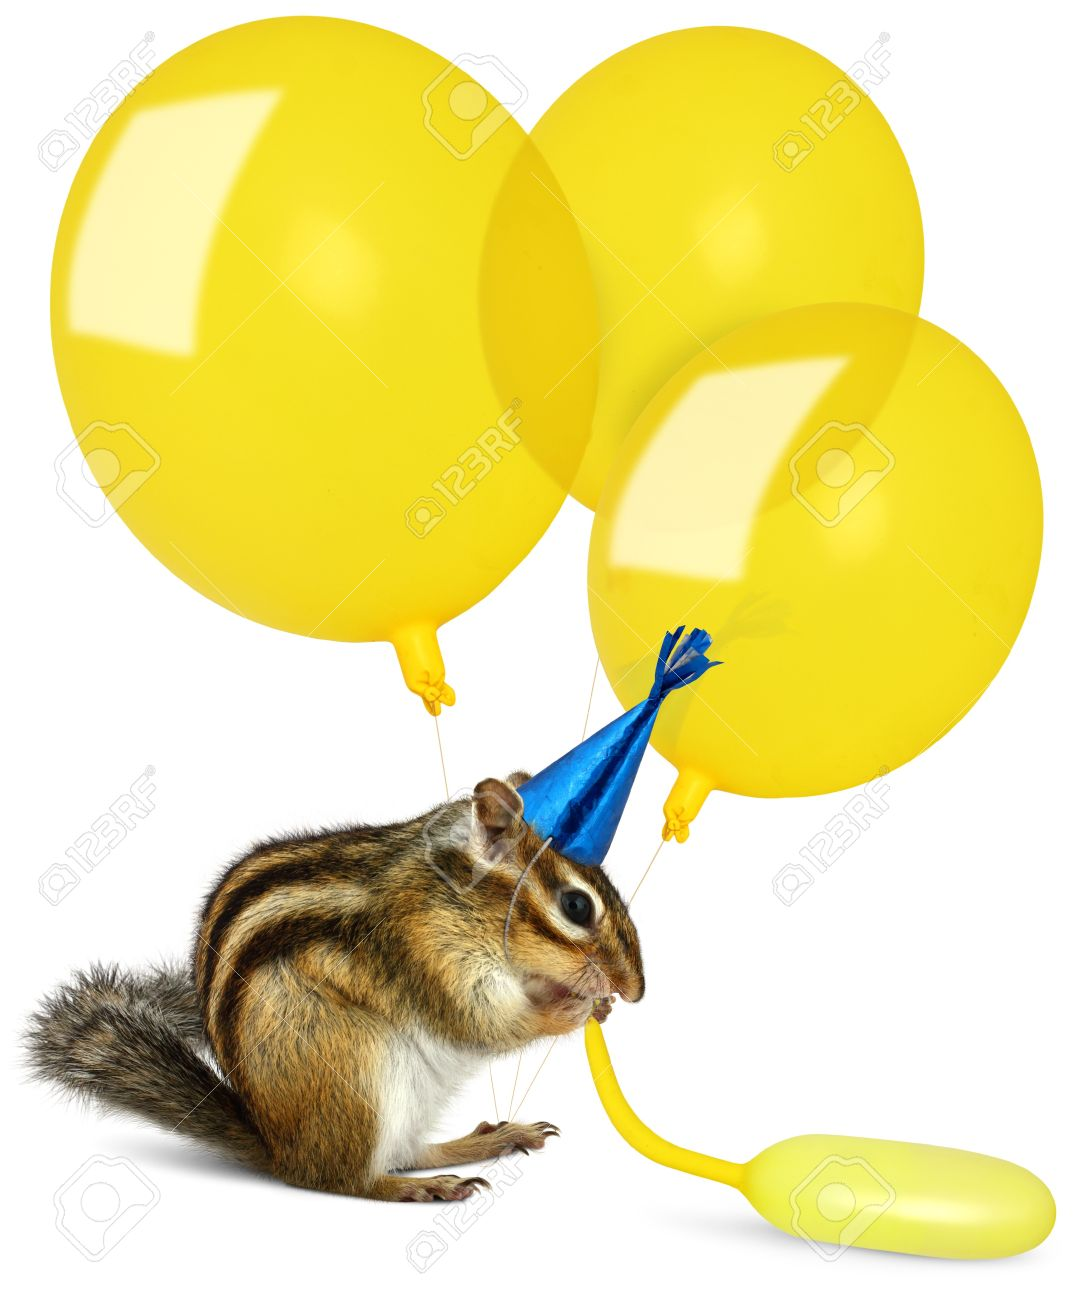 http://previews.123rf.com/images/dimjul/dimjul1207/dimjul120700017/14646535-Funny-chipmunk-inflating-yellow-balloons-wearing-birthday-hat-Stock-Photo.jpg